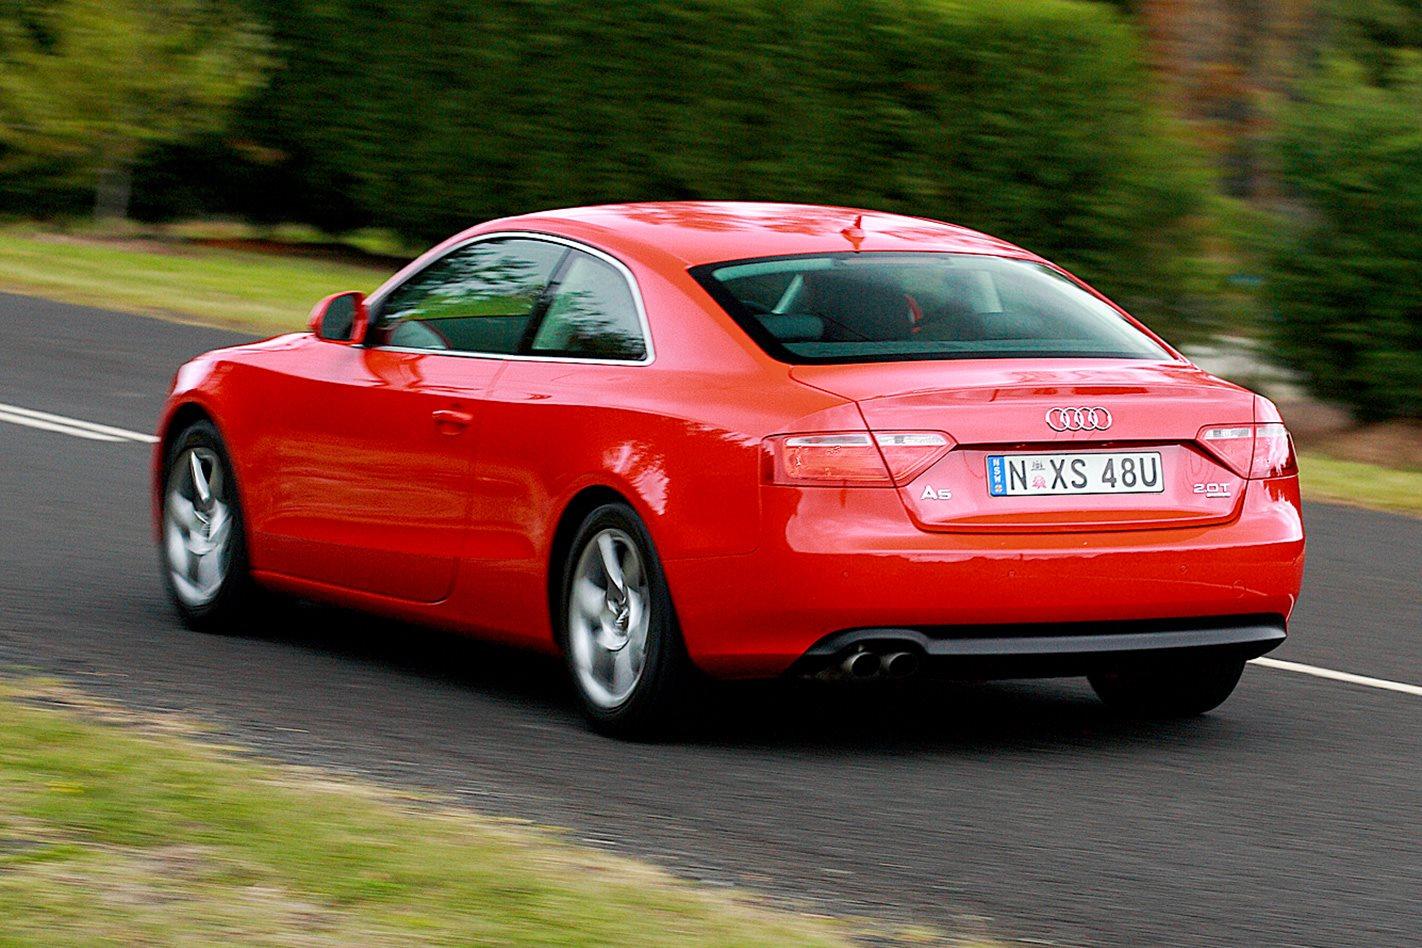 2009-Audi-A5-2.0T-quattro-rear.jpg